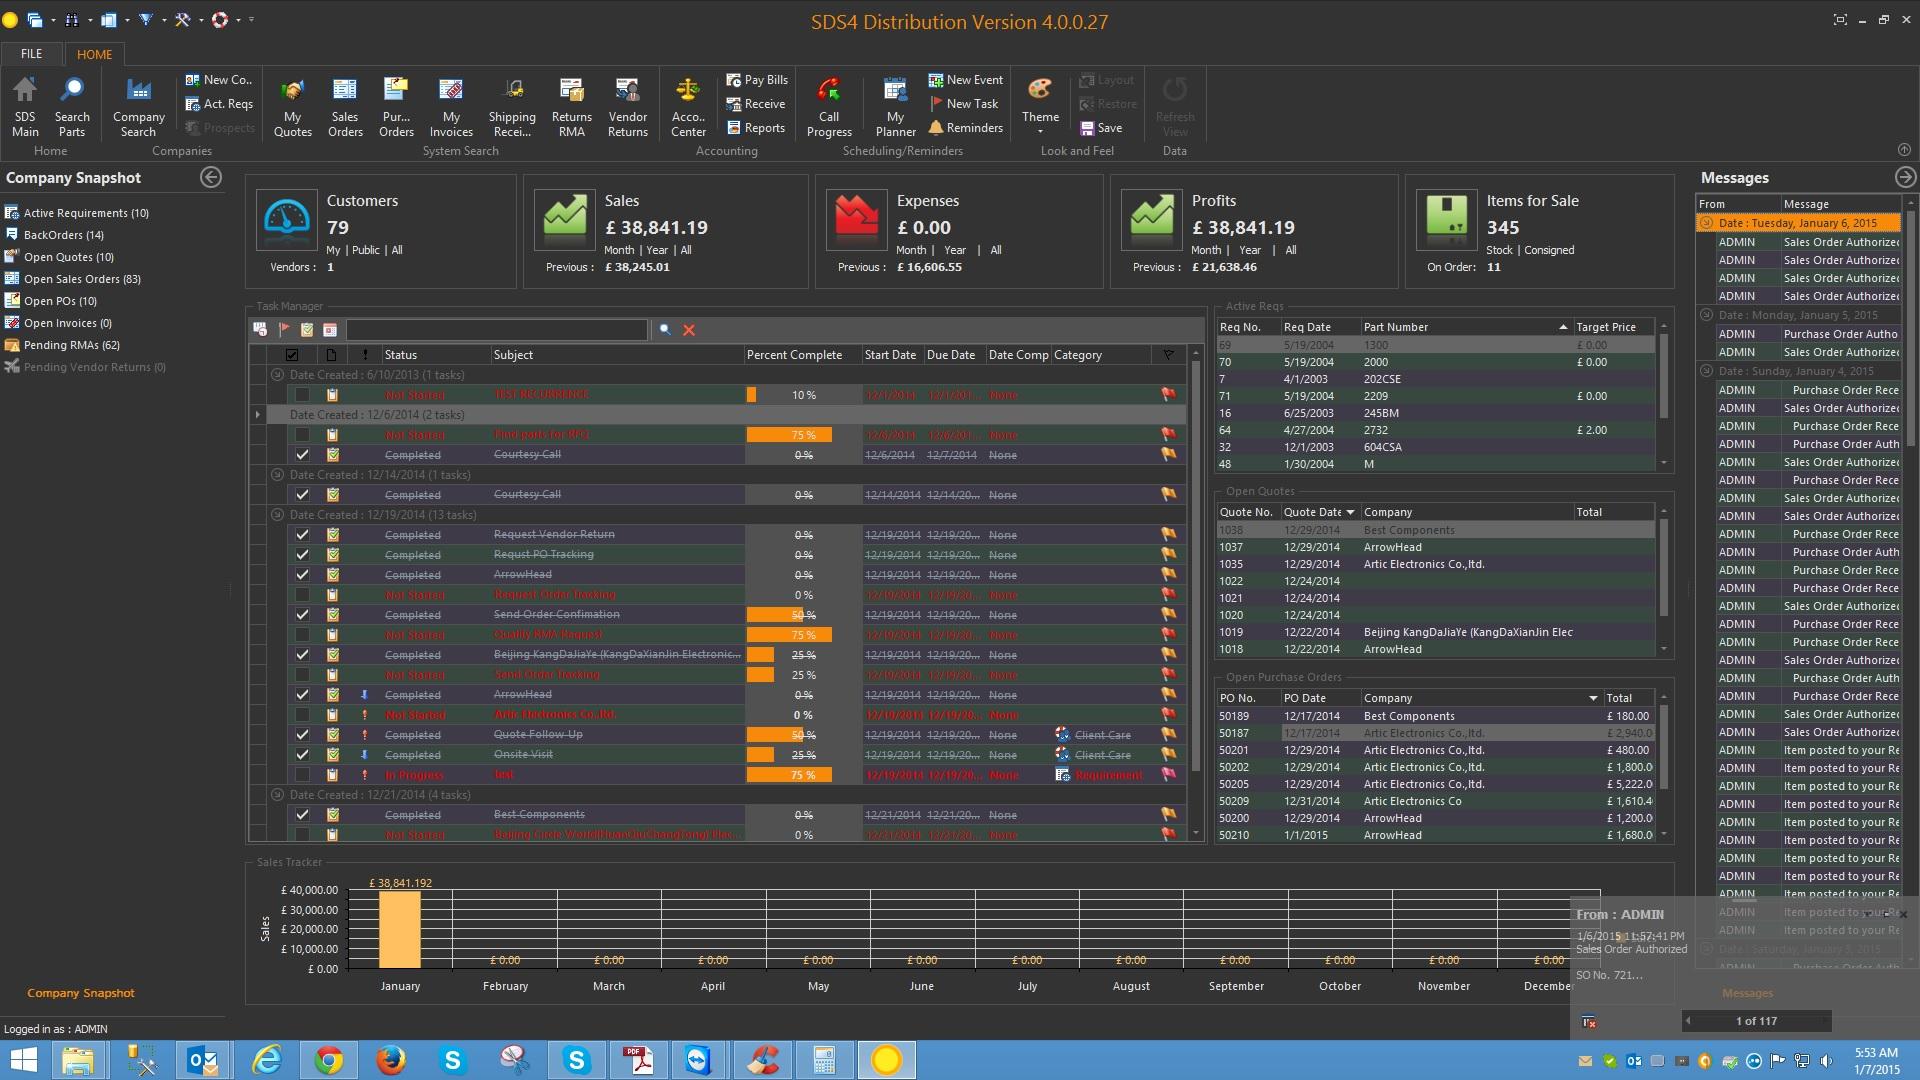 SDS4 Distribution Software Software - Dark theme